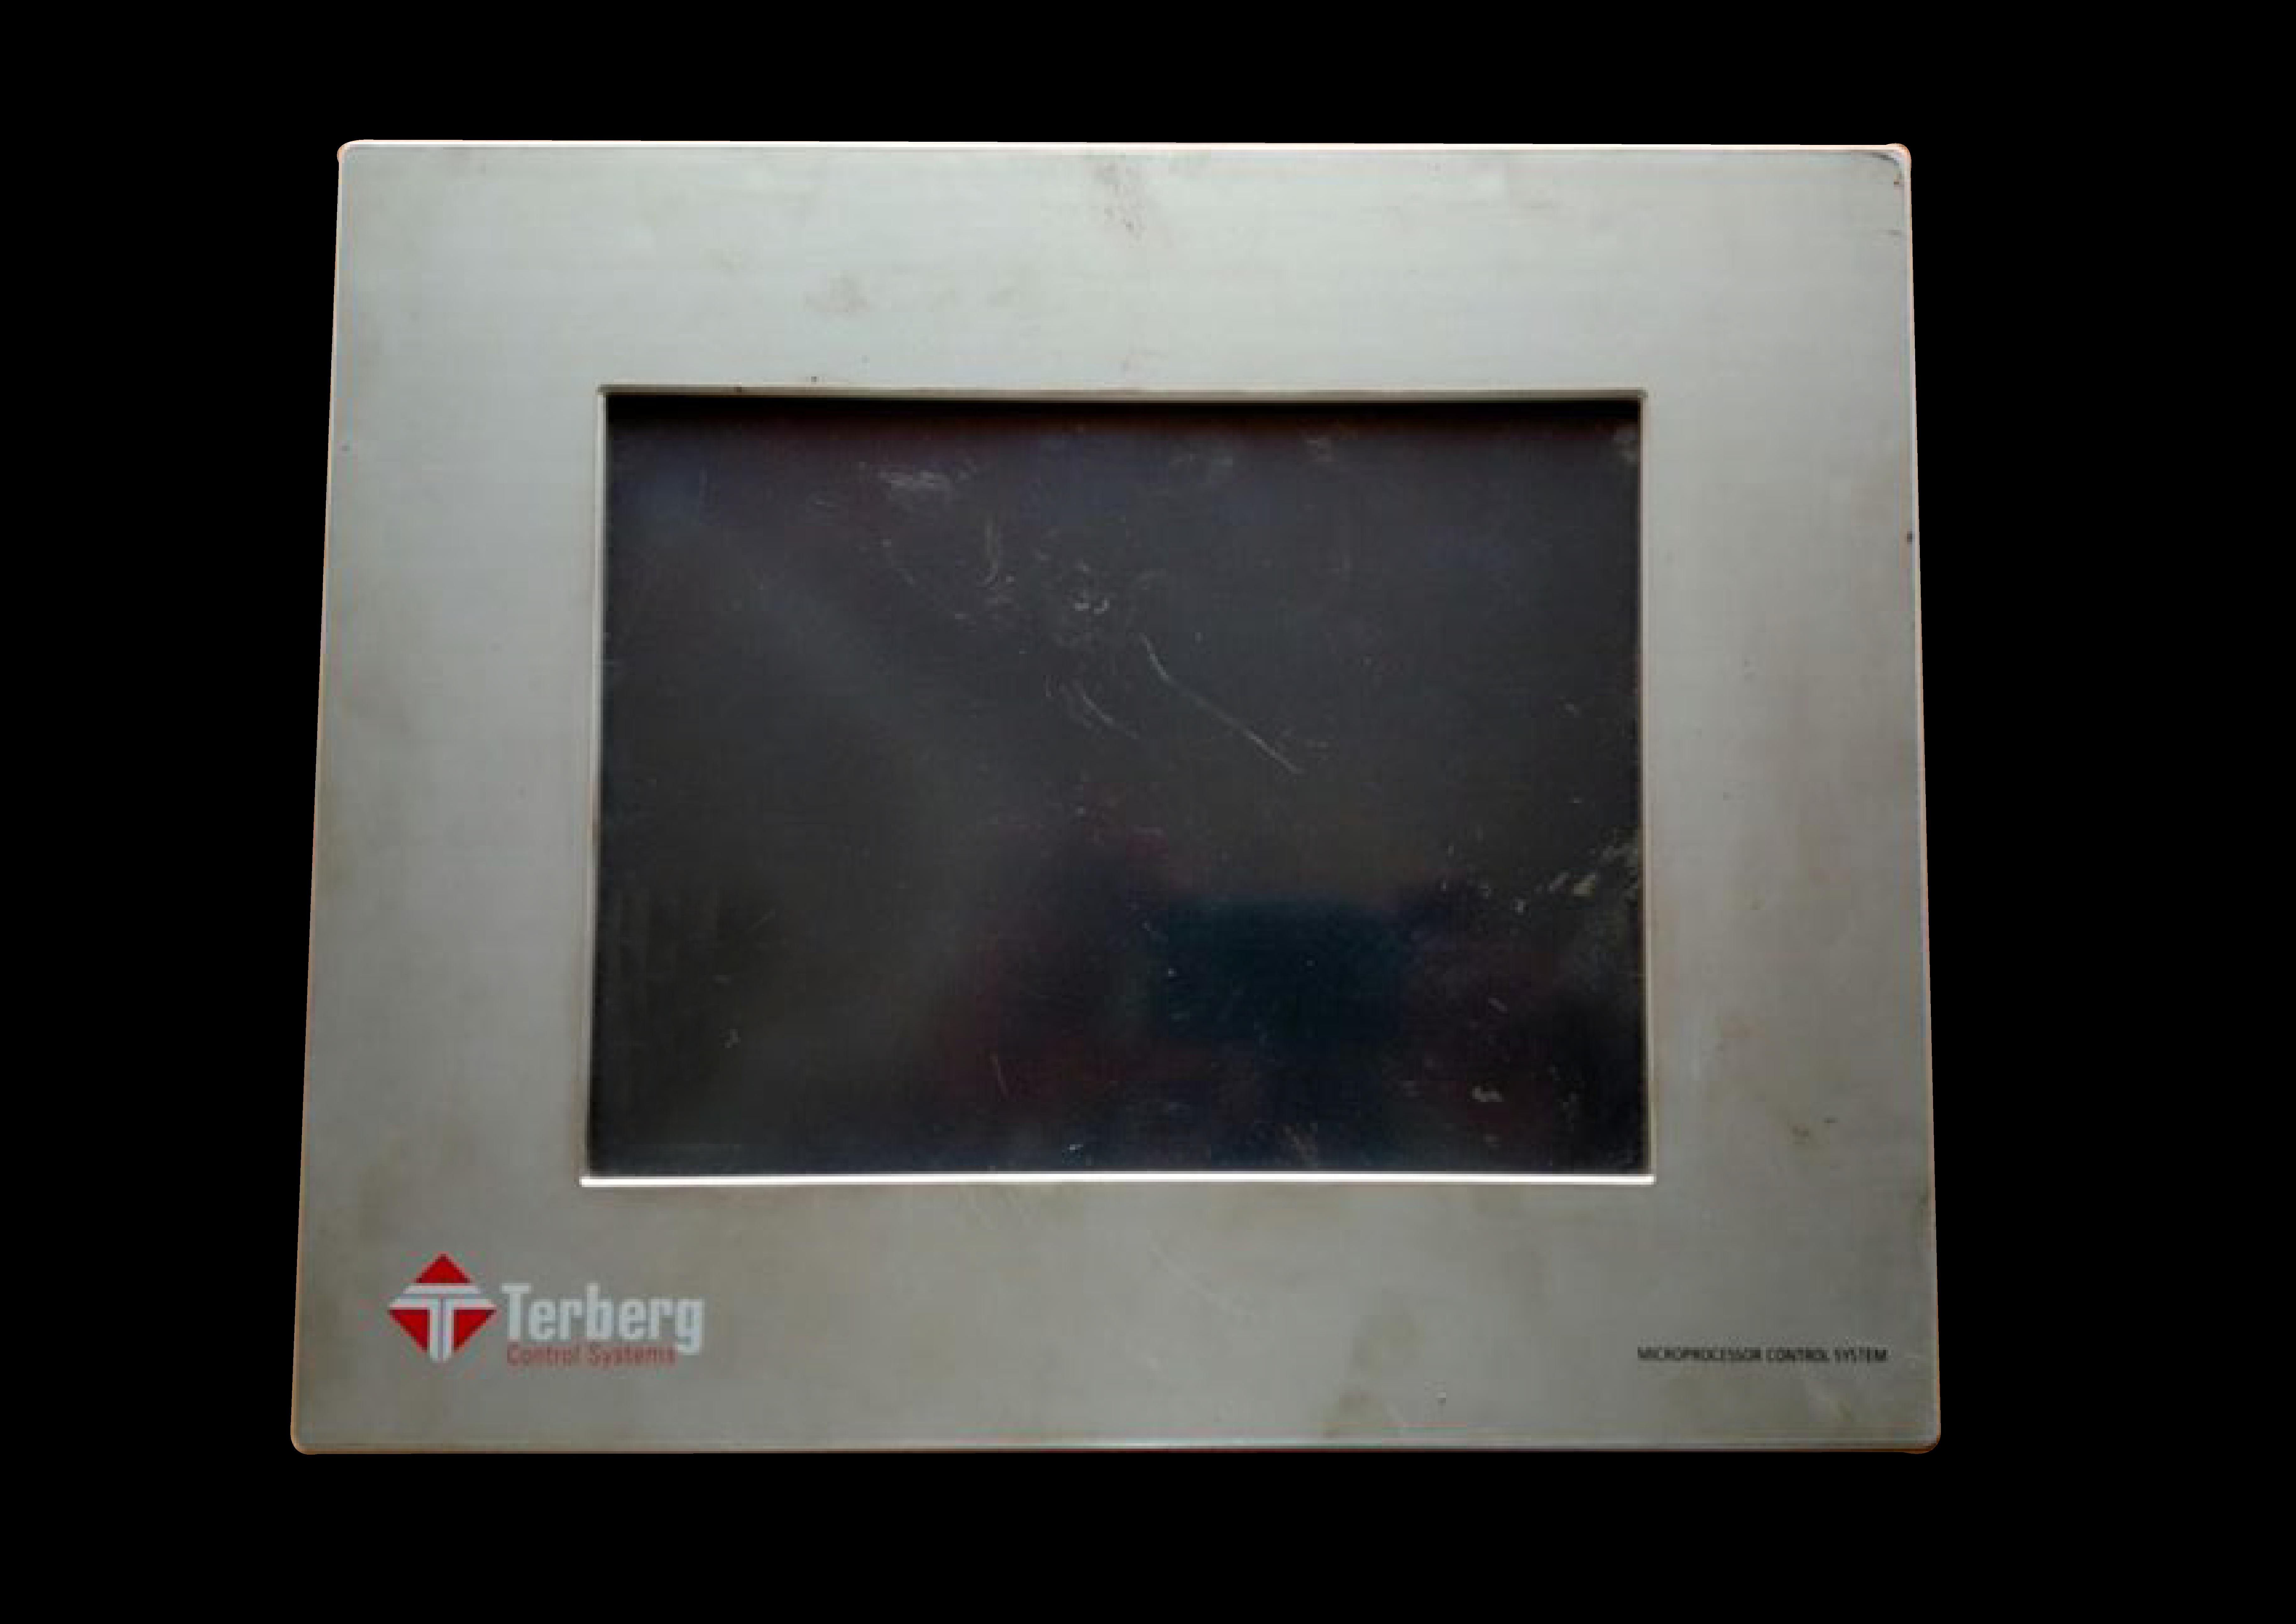 Terberg IPC